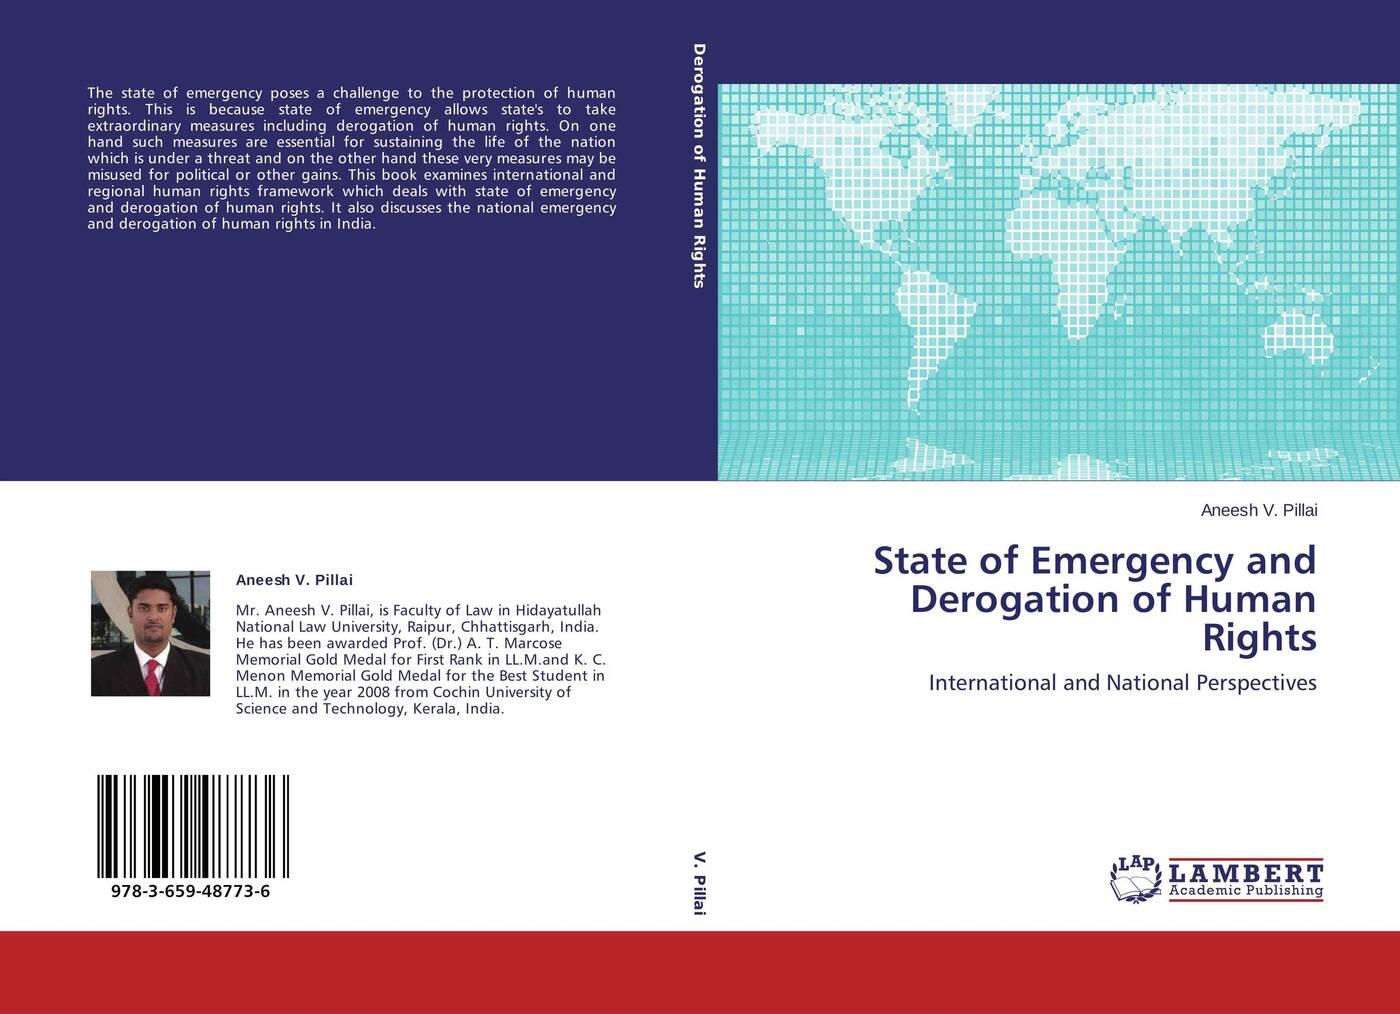 Aneesh V. Pillai State of Emergency and Derogation of Human Rights veronika haász national human rights institutions in the un human rights framework